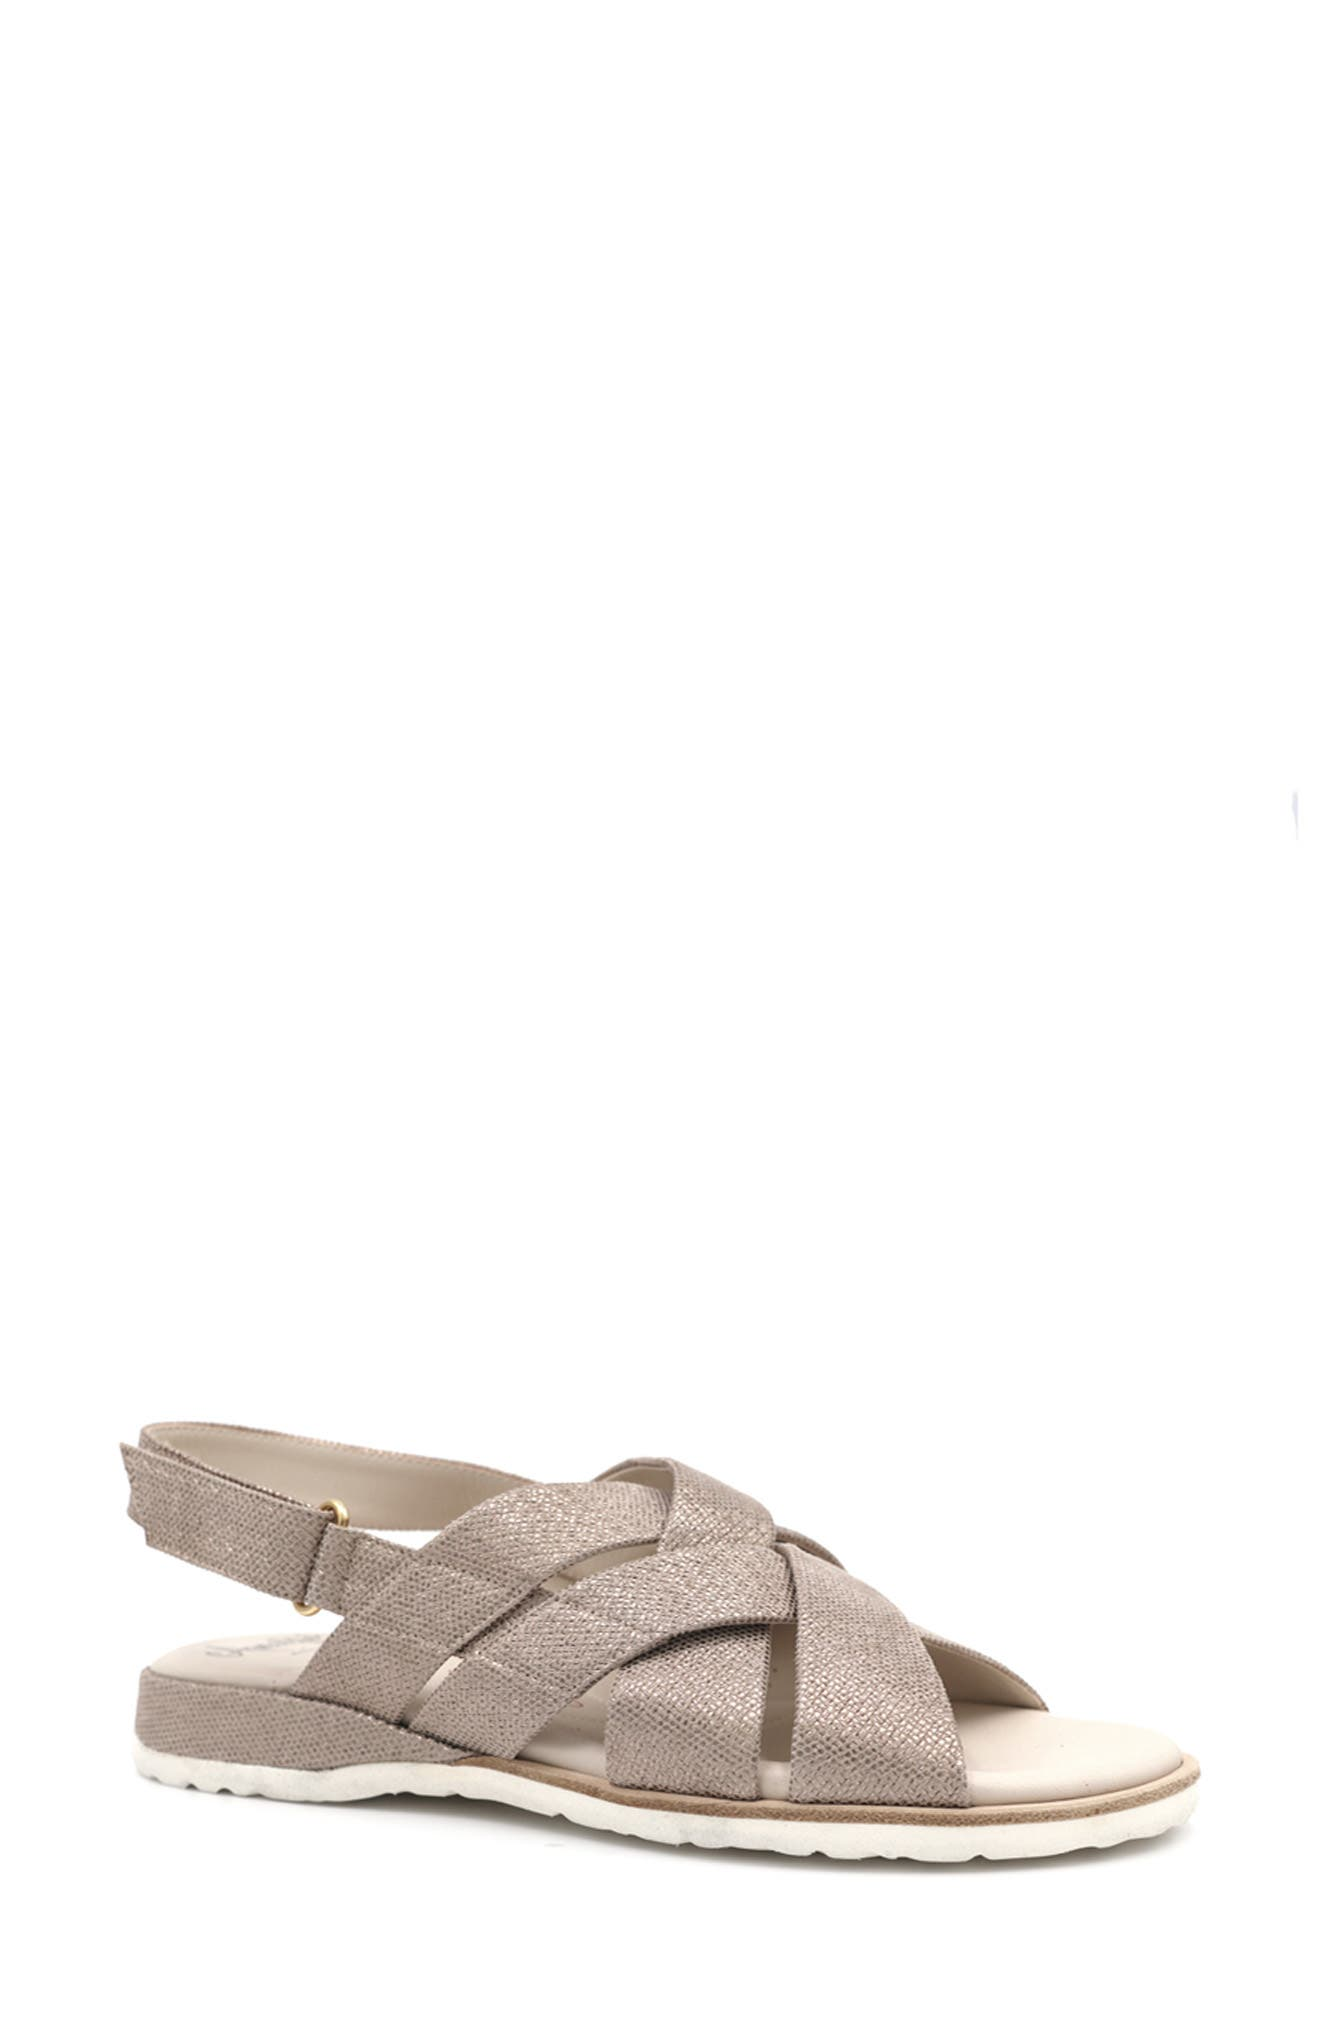 Biondina Textured Sandal